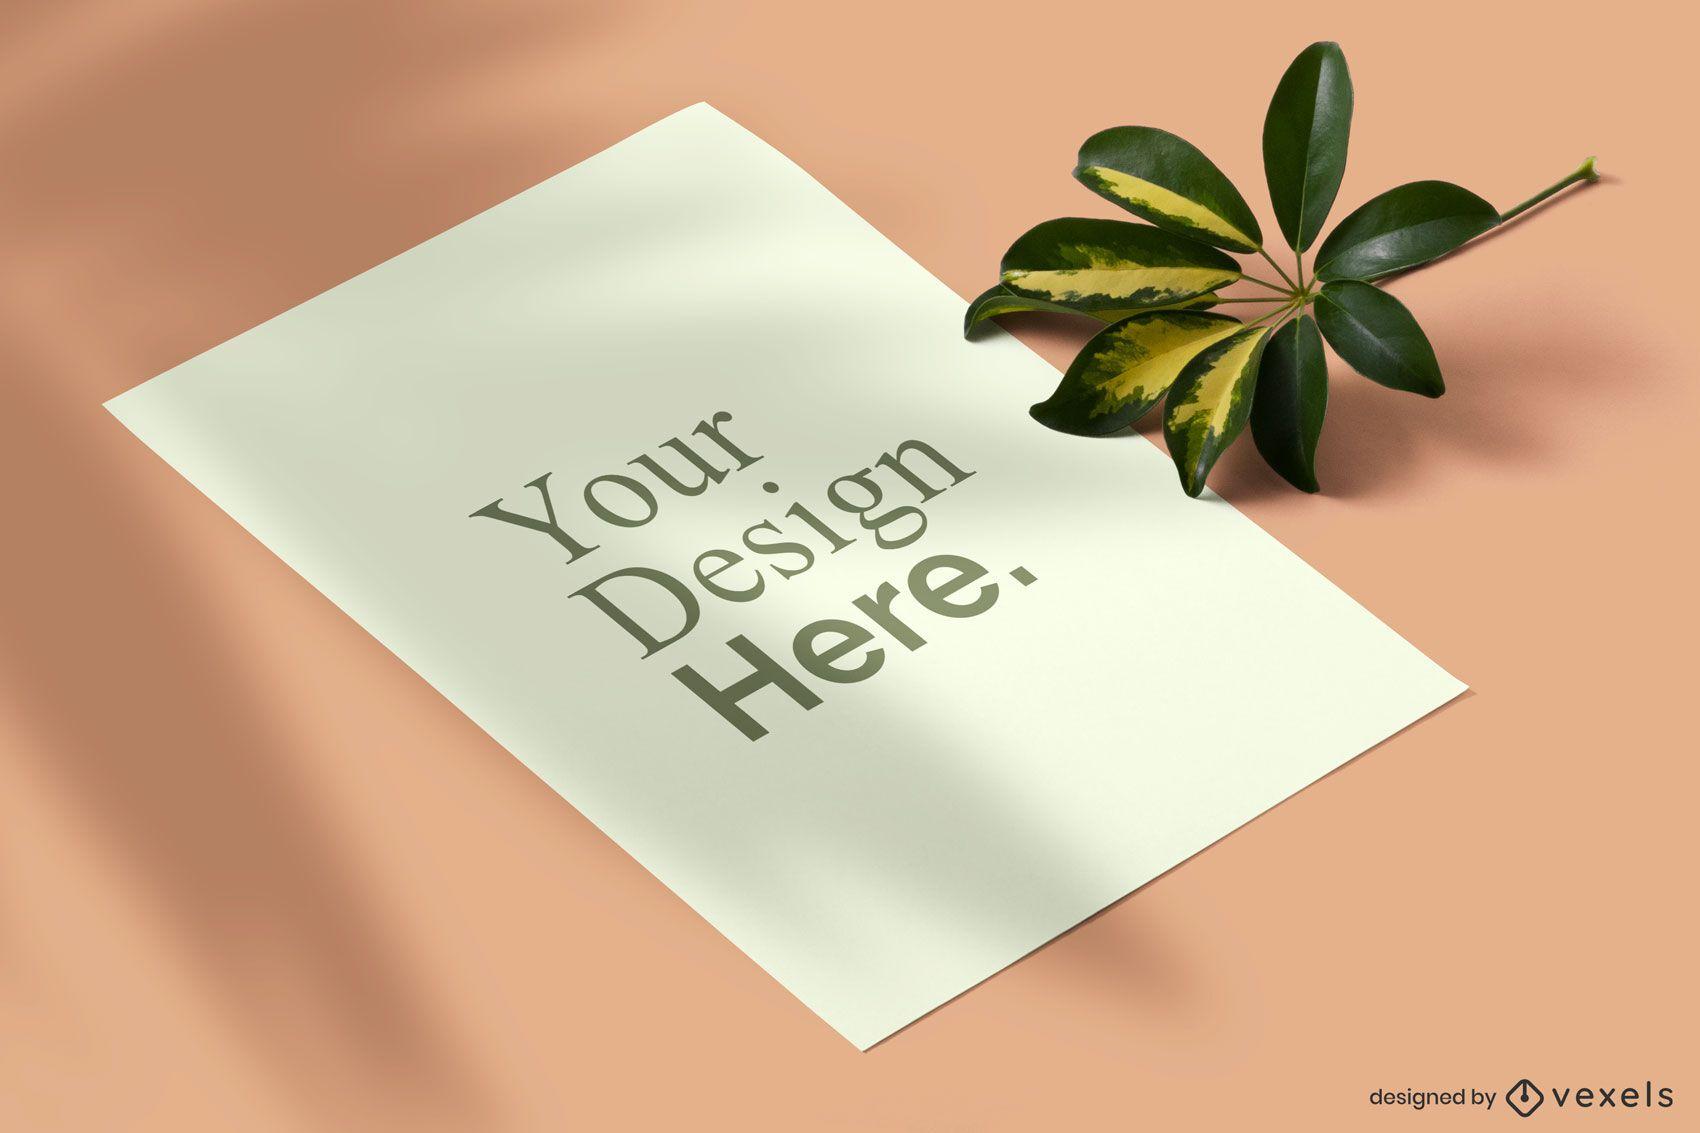 Isometric Nature Poster Mockup Design